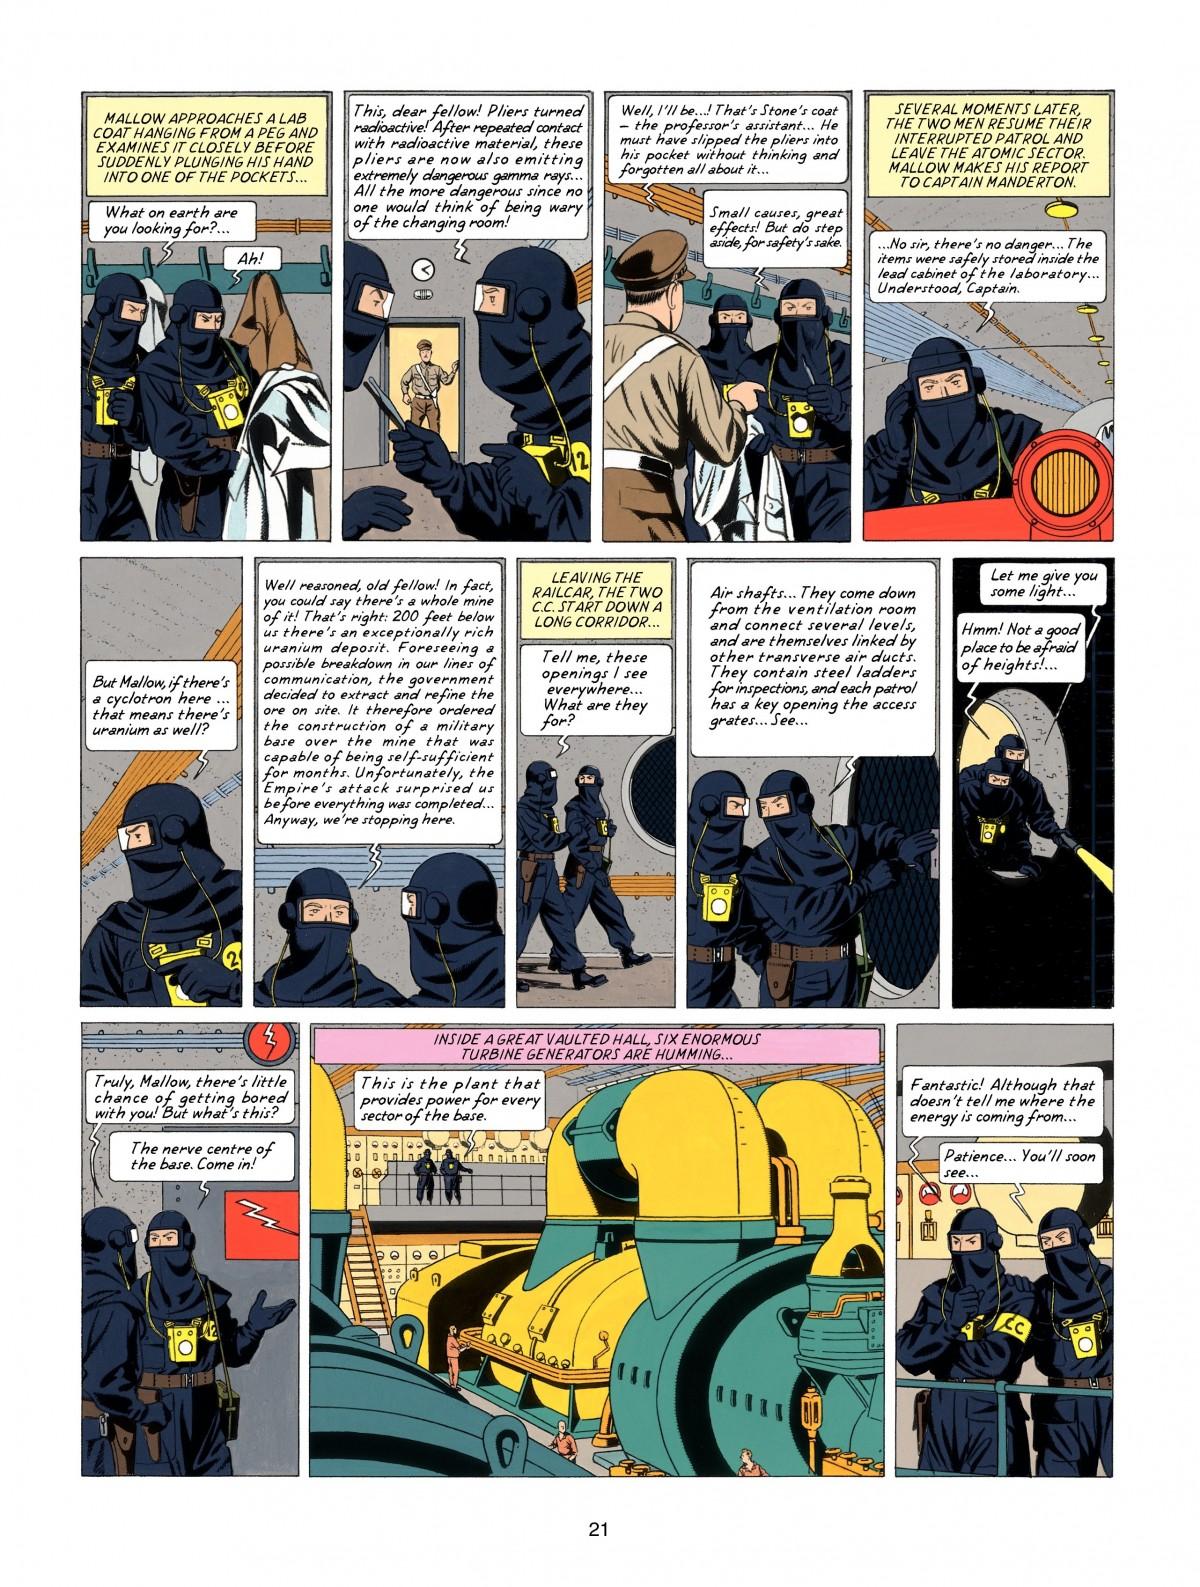 Blake Mortimer Issue 17 | Viewcomic reading comics online